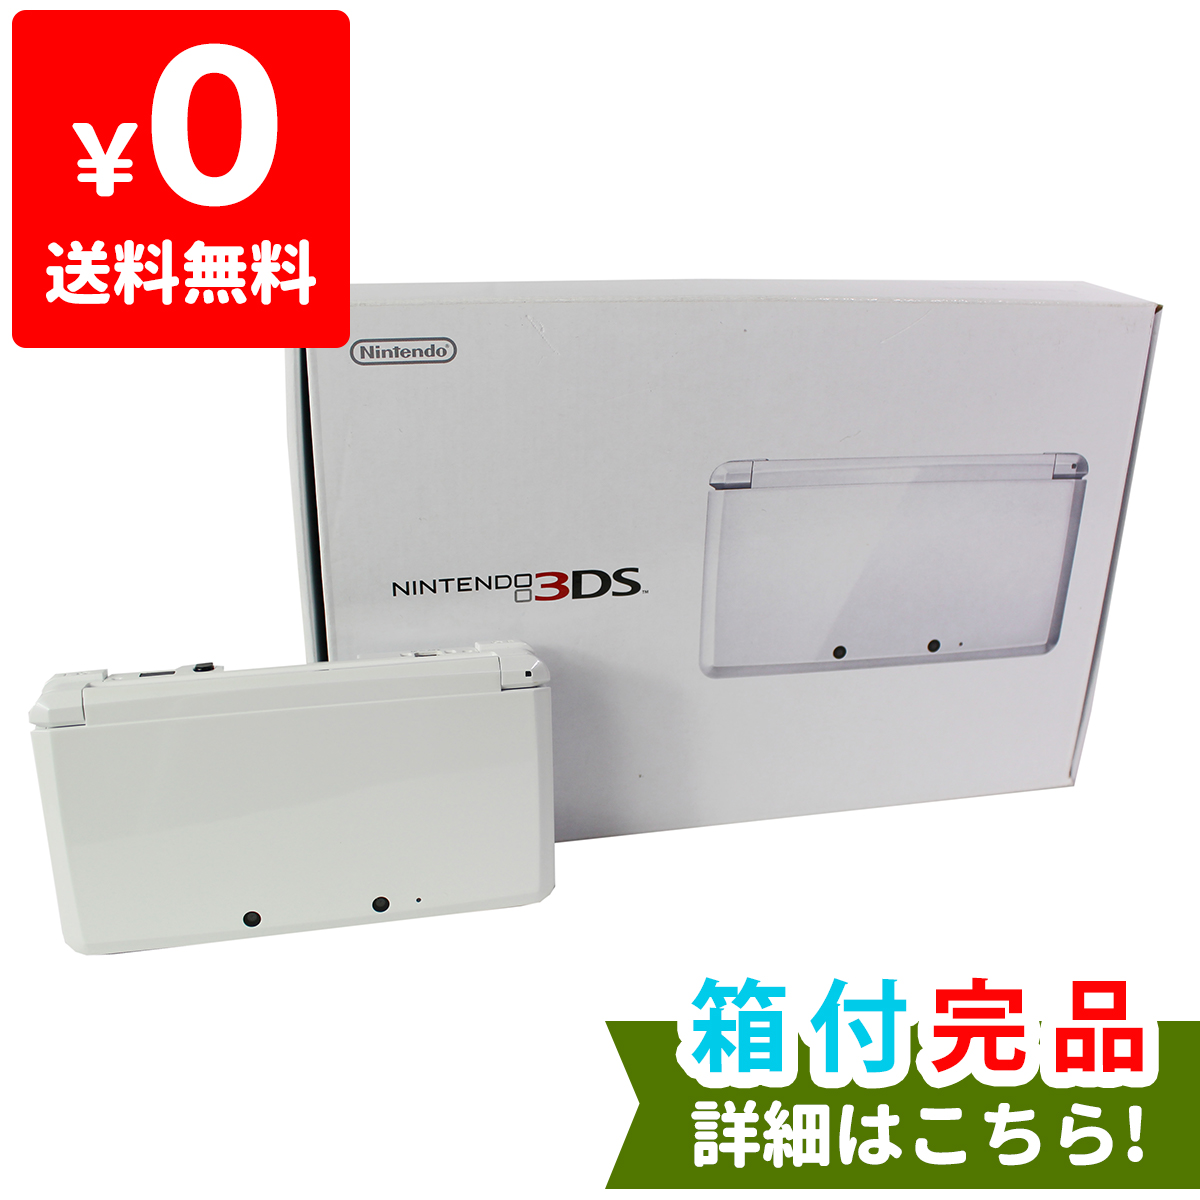 3DS アイスホワイト 本体 メーカー生産終了 ニンテンドー 任天堂 NINTENDO ゲーム機 【中古】 4902370519136